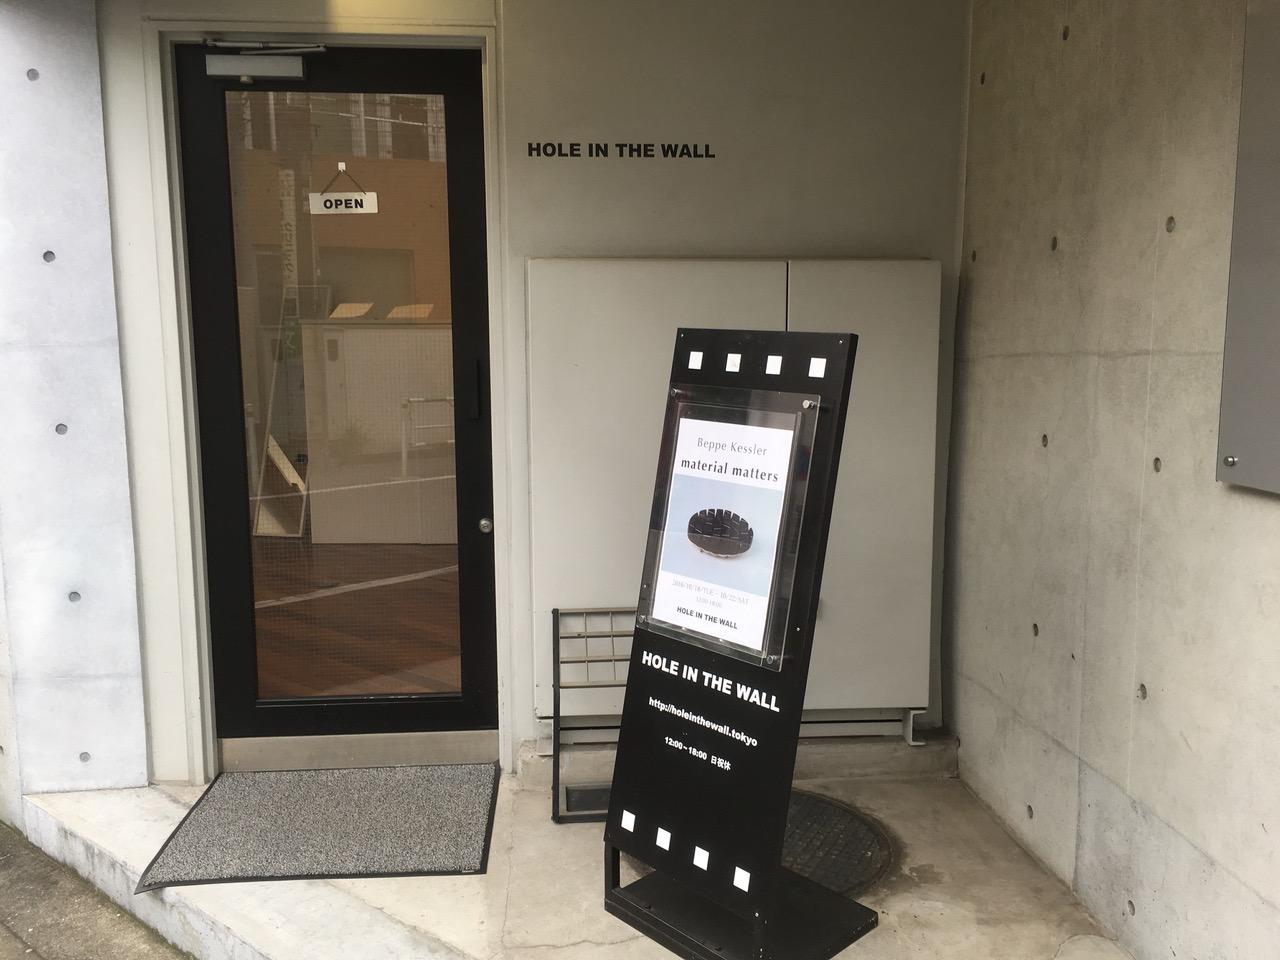 Hiko Mizuno College of Jewelry, Tokyo, Hole in the Wall, 2016. Foto Beppe Kessler, galerie, ingang, tentoonstelling, Beppe Kessler, Material matters